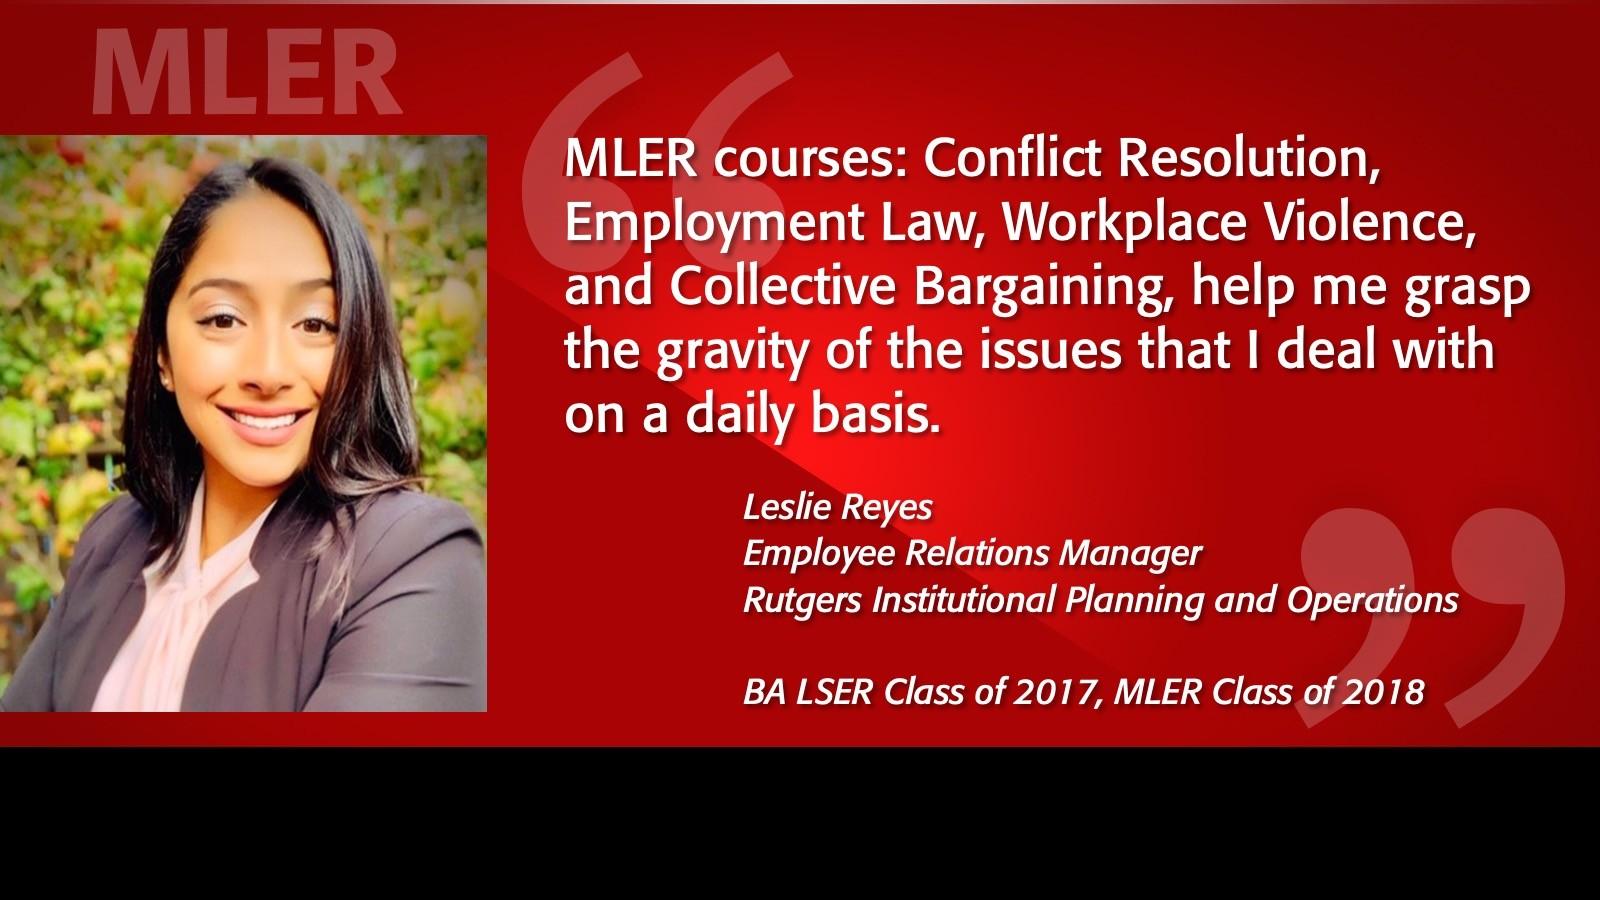 Image of Leslie Reyes Alumni Testimonial